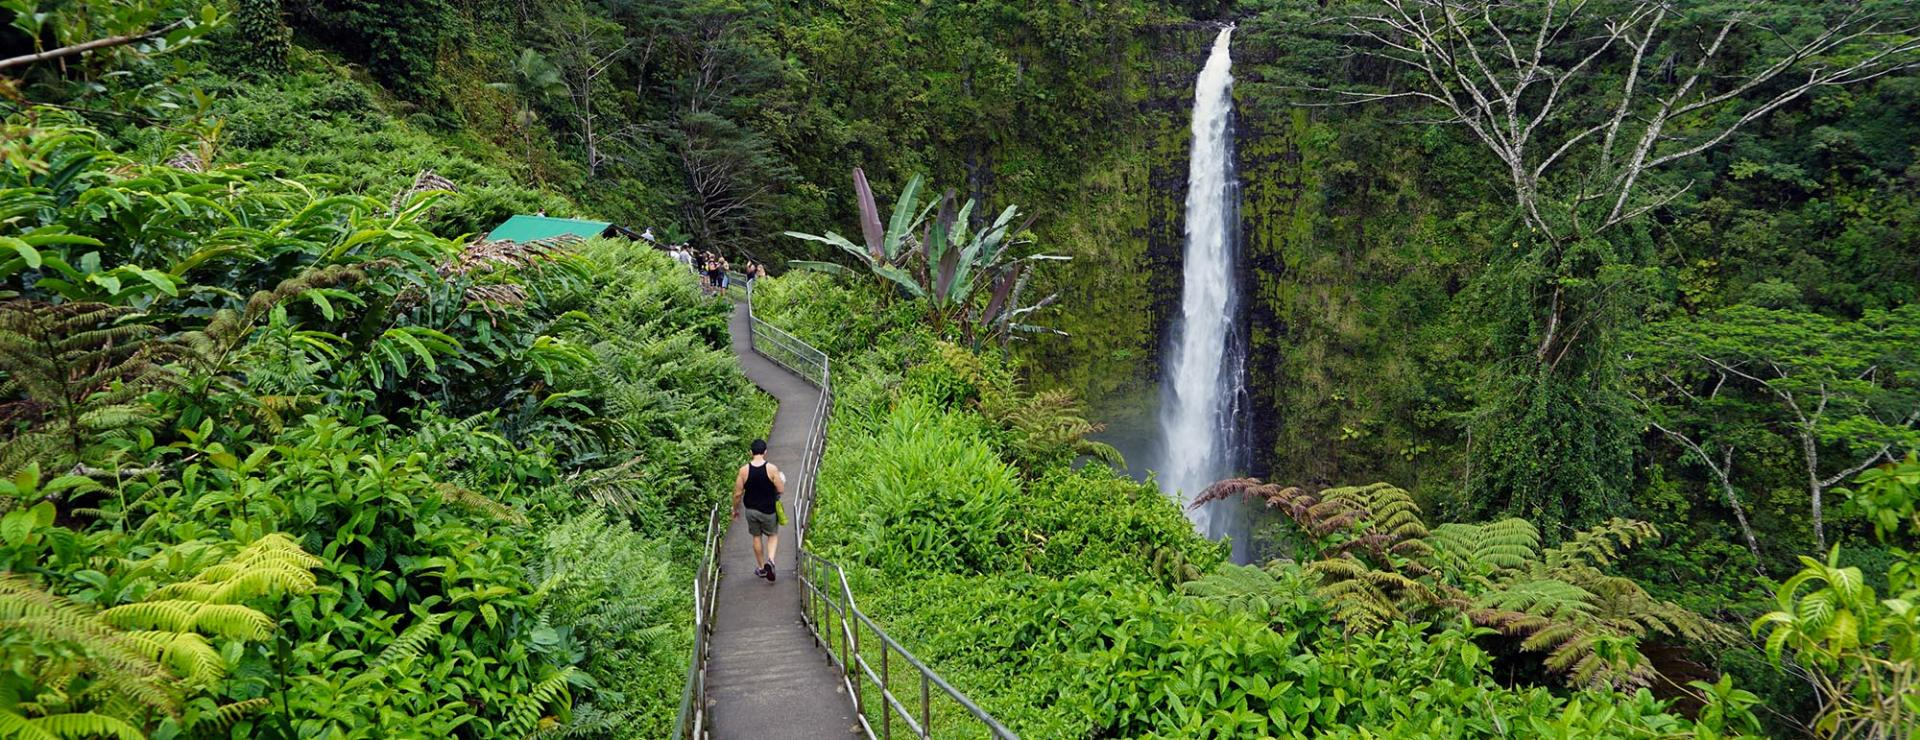 Woman hiking by waterful in Hawaii